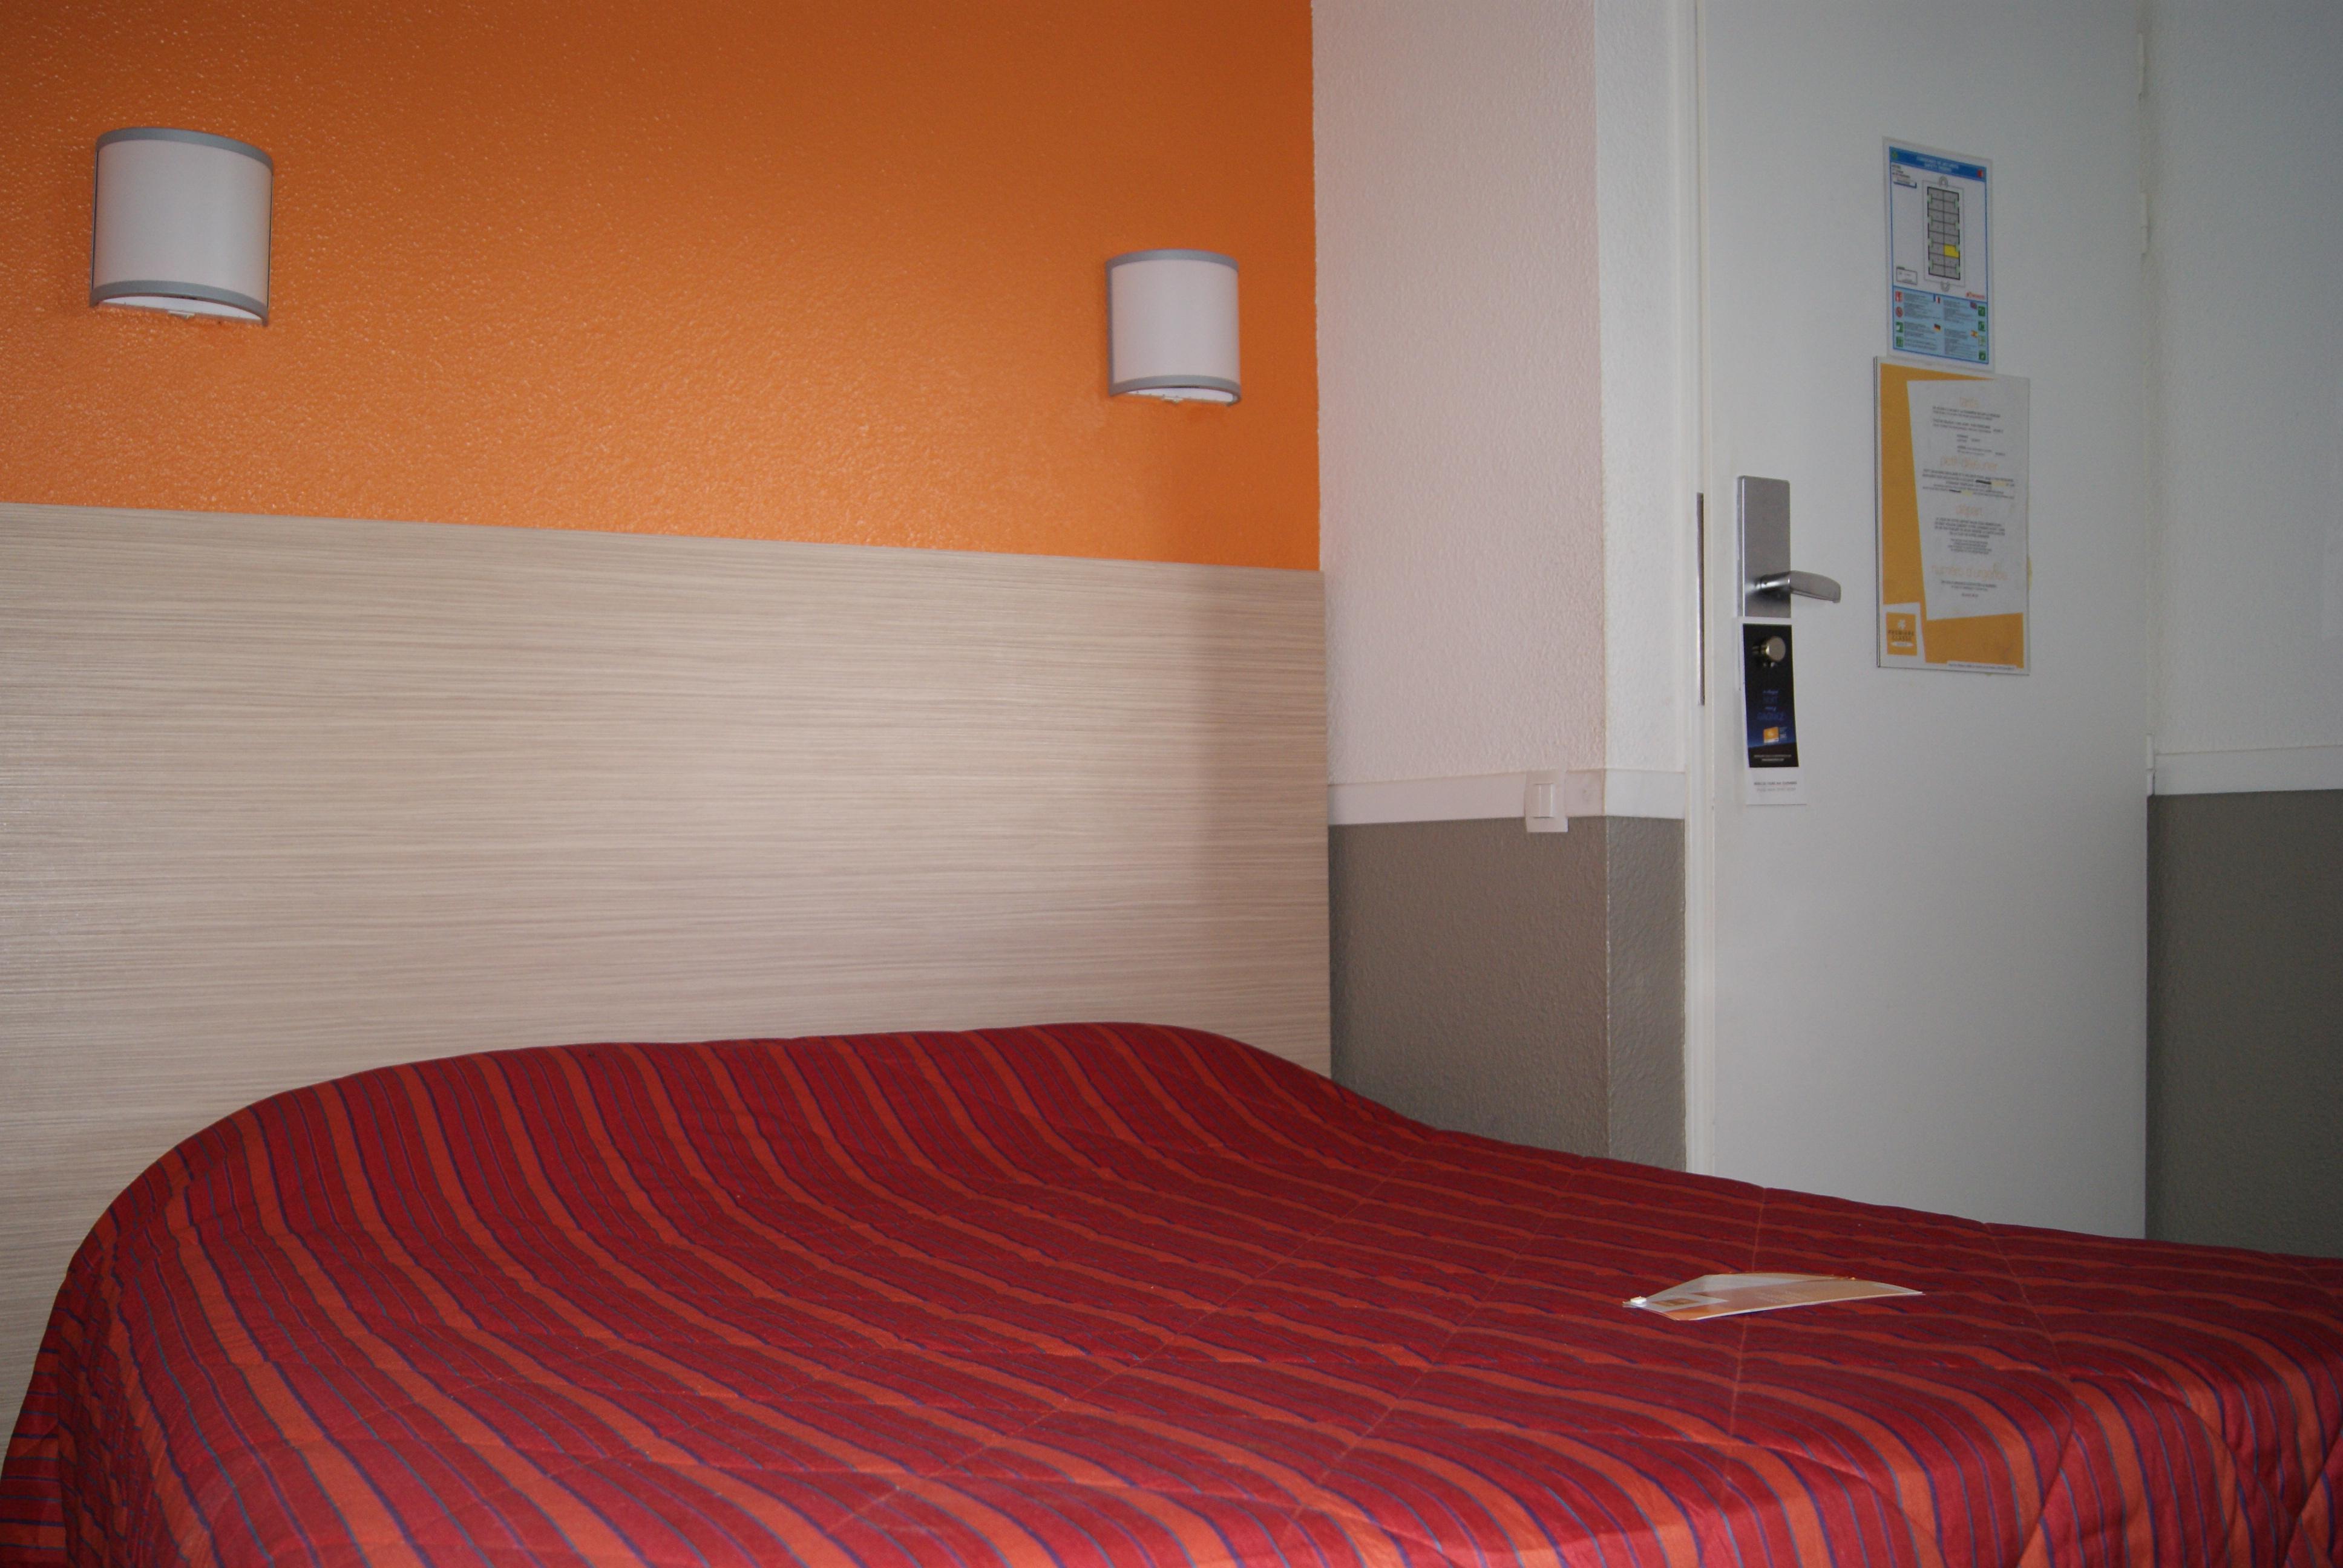 Hotel Premiere Classe Colmar Nord - Houssen